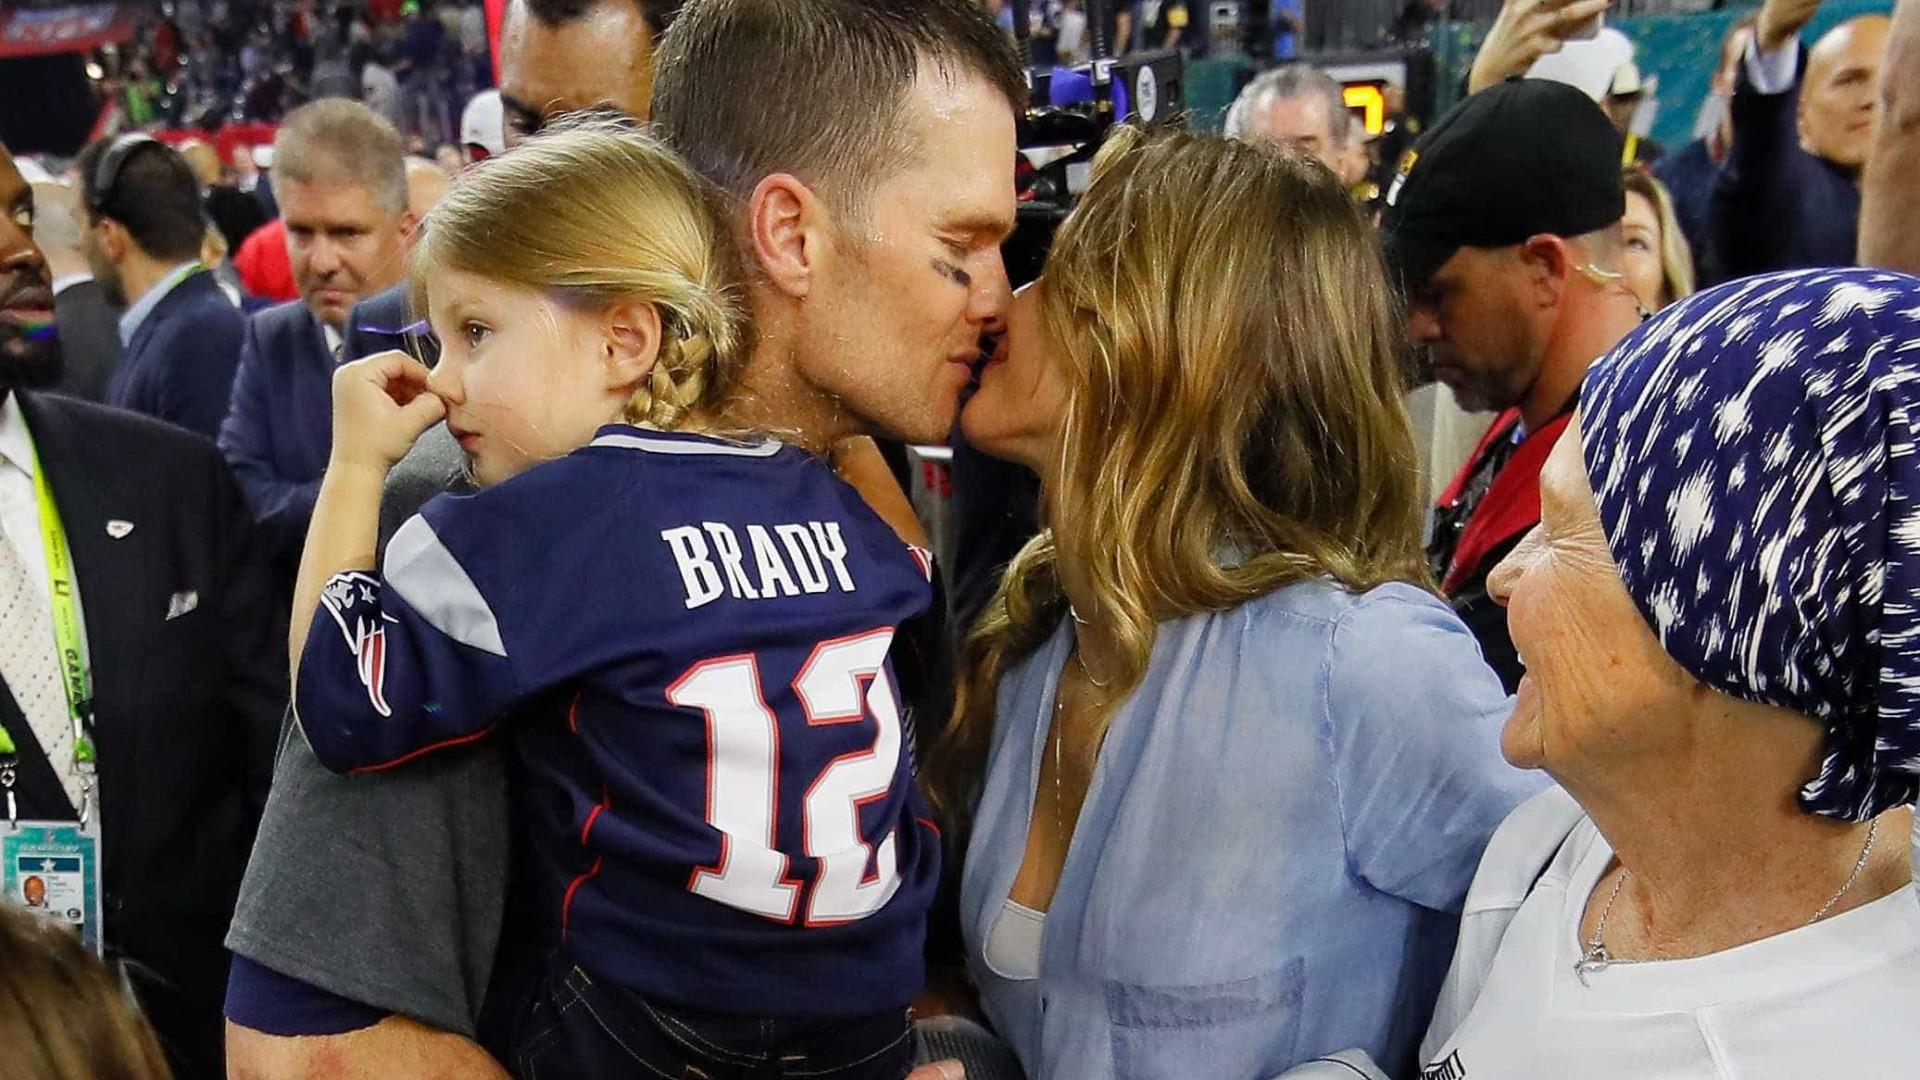 Gisele Bündchen e Tom Brady preparam-se para aumentar a família?